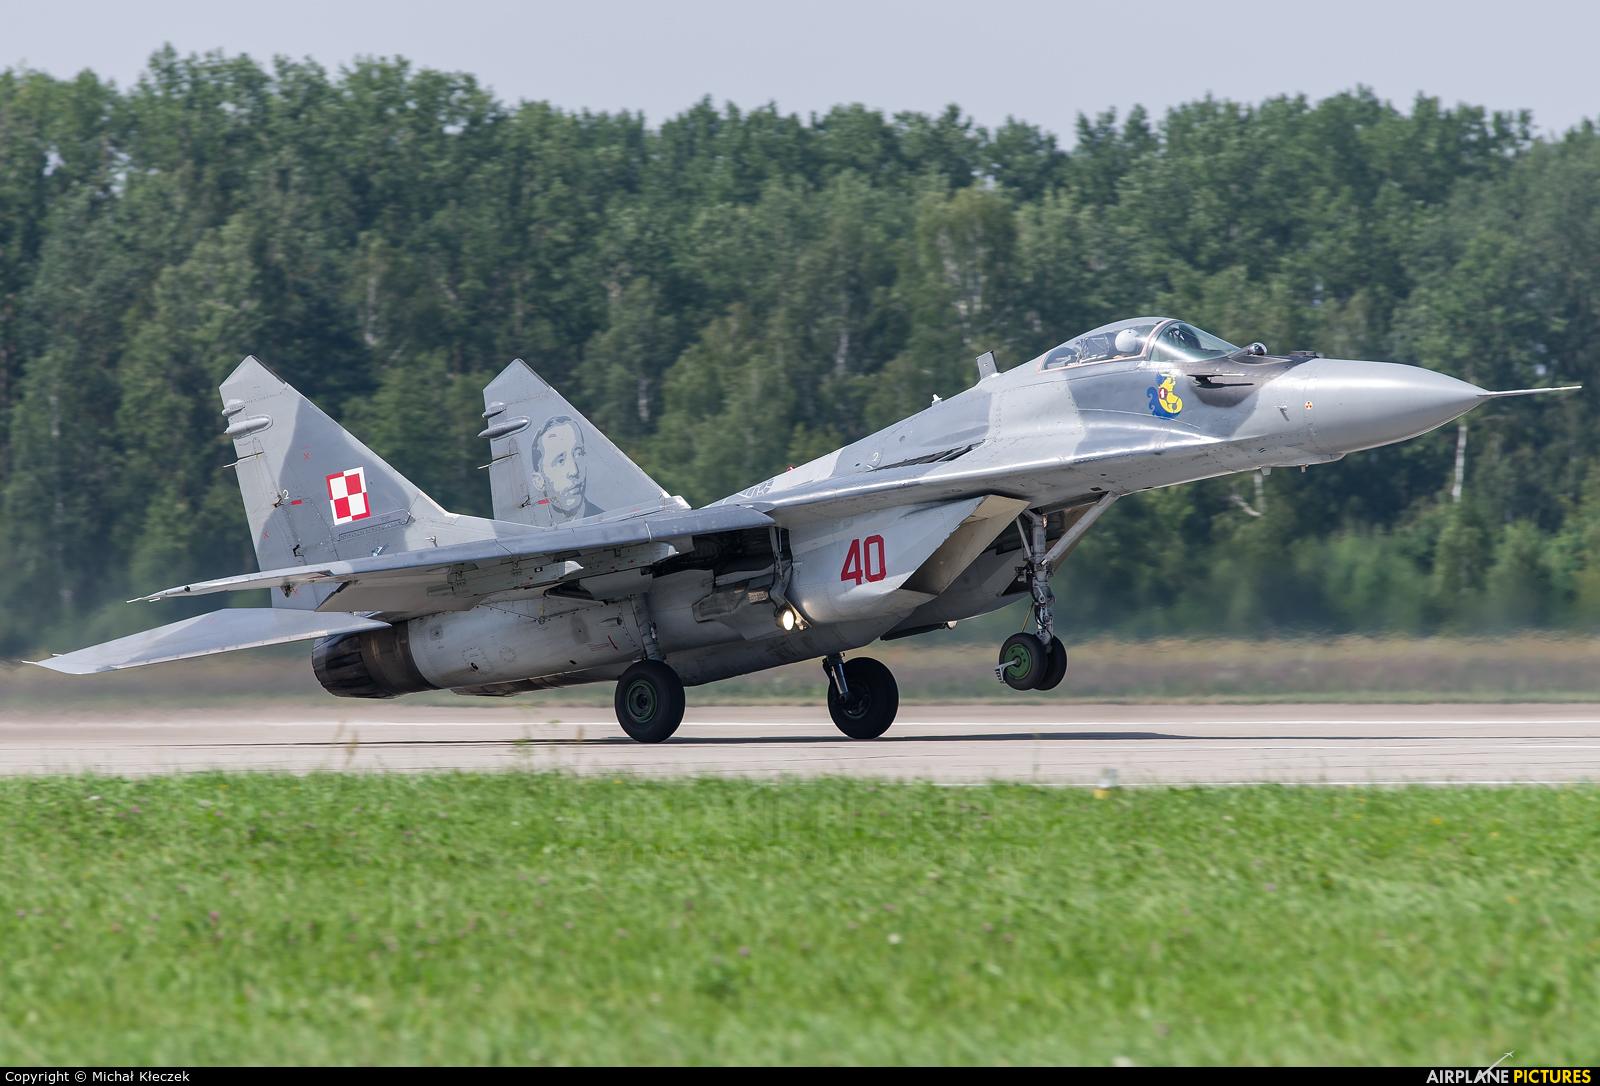 Poland - Air Force 40 aircraft at Mińsk Mazowiecki